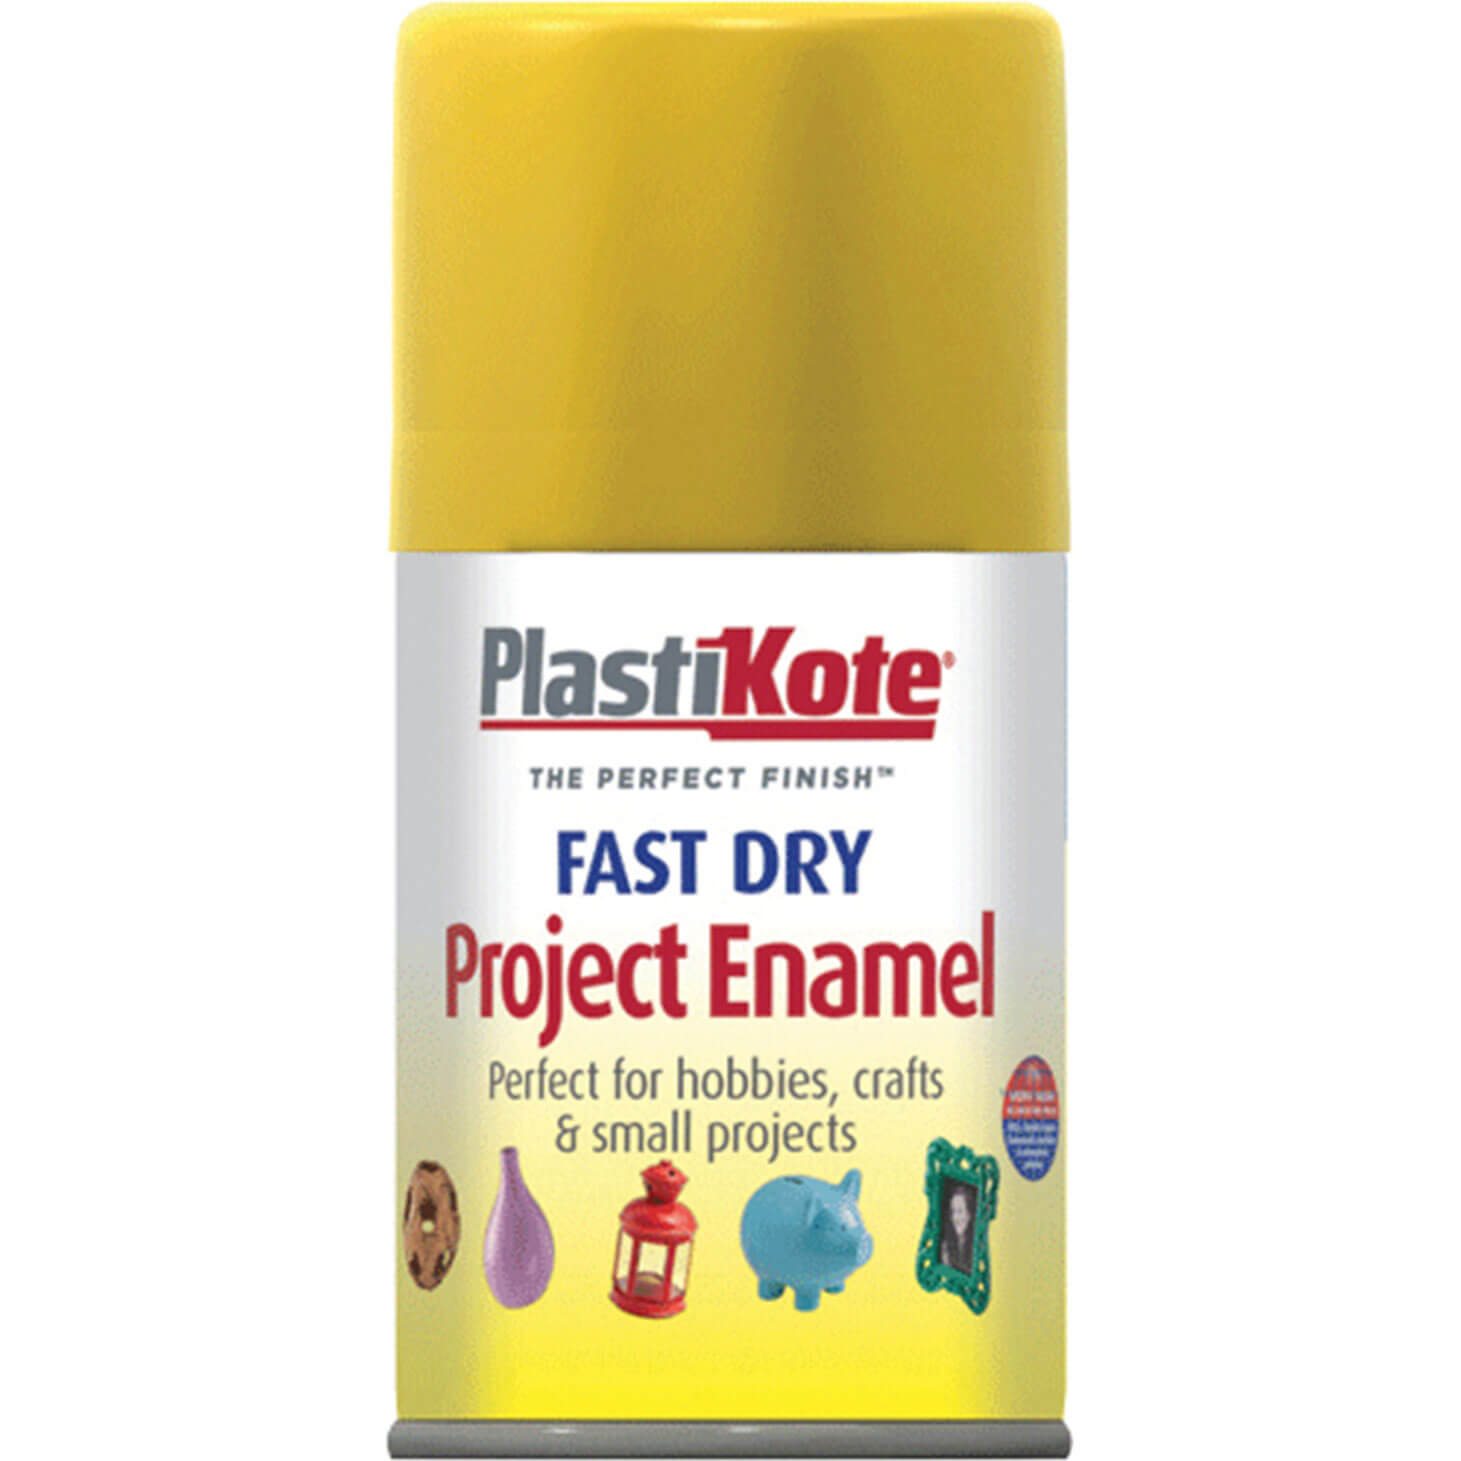 Image of Plastikote Dry Enamel Aerosol Spray Paint Buttercup Yellow 100ml